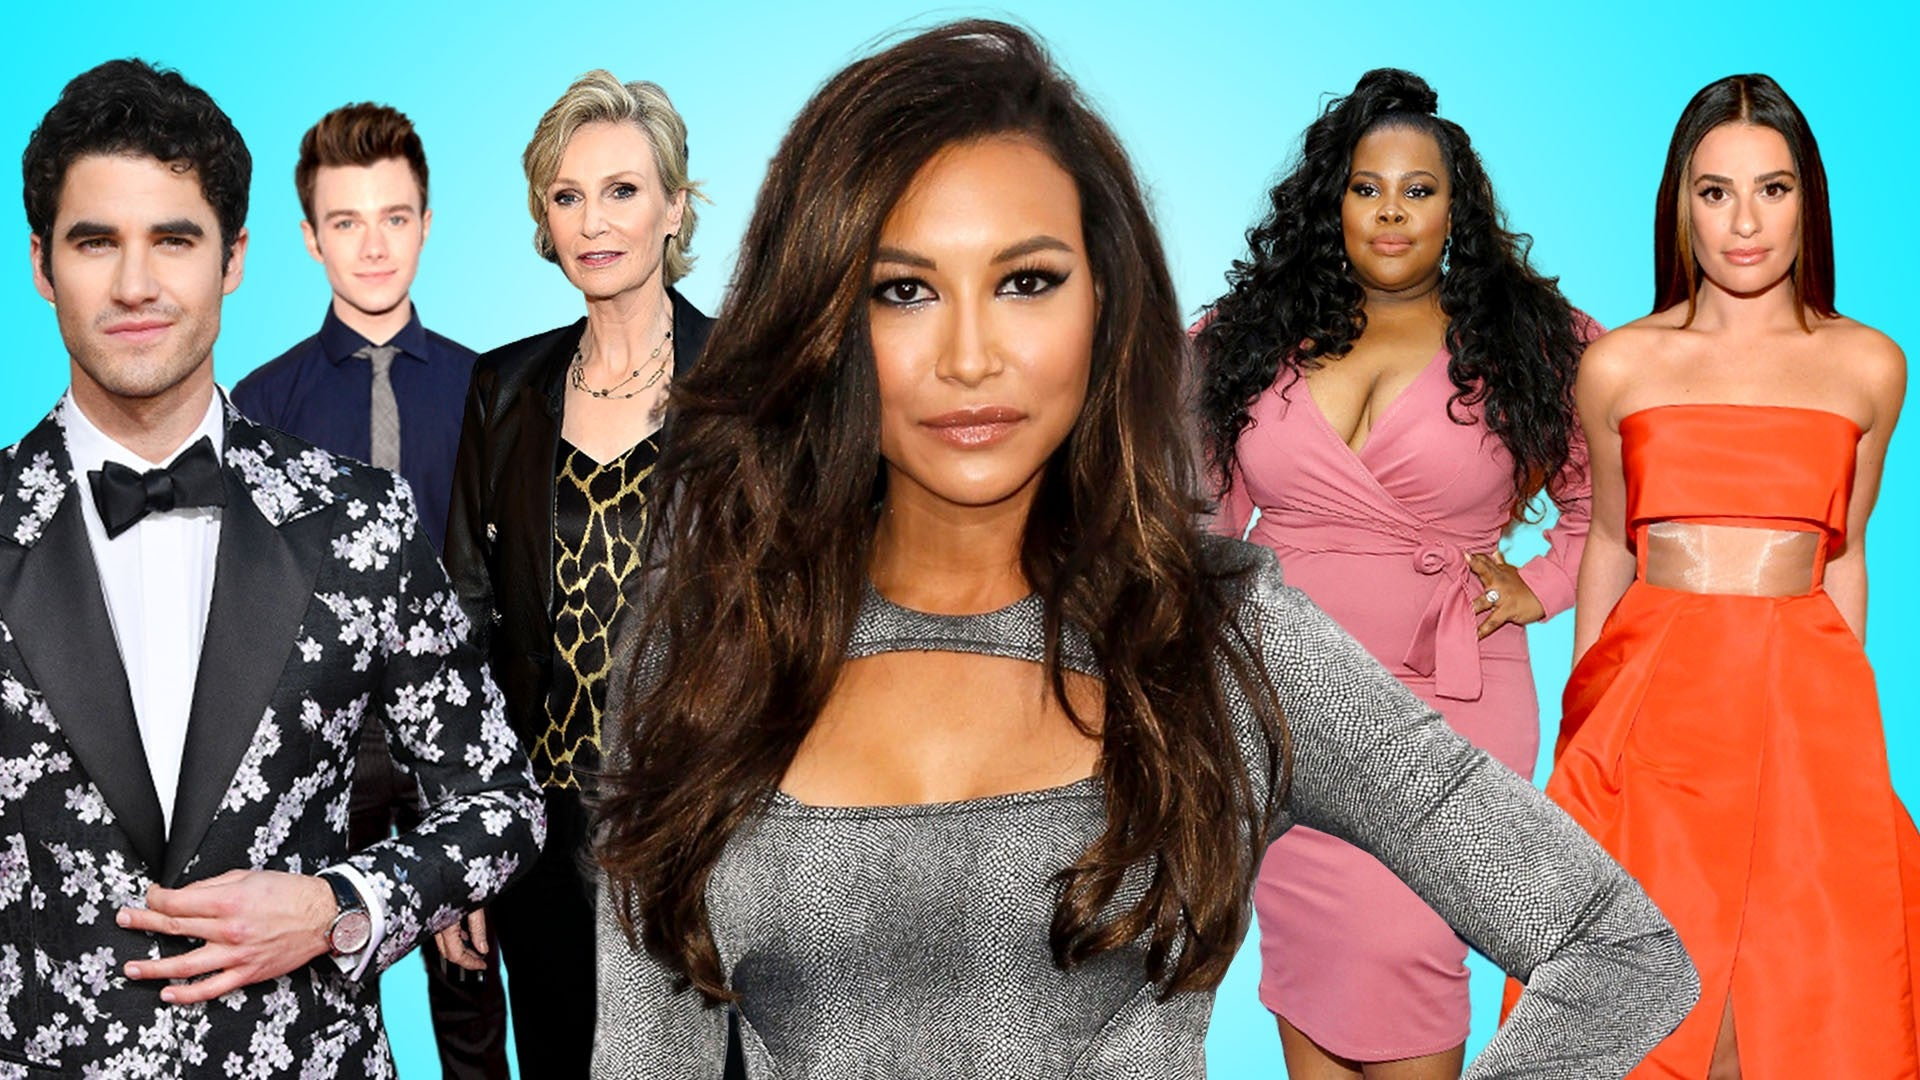 Naya Rivera Dead At 33 Actress Glee Co Stars And Friends Pay